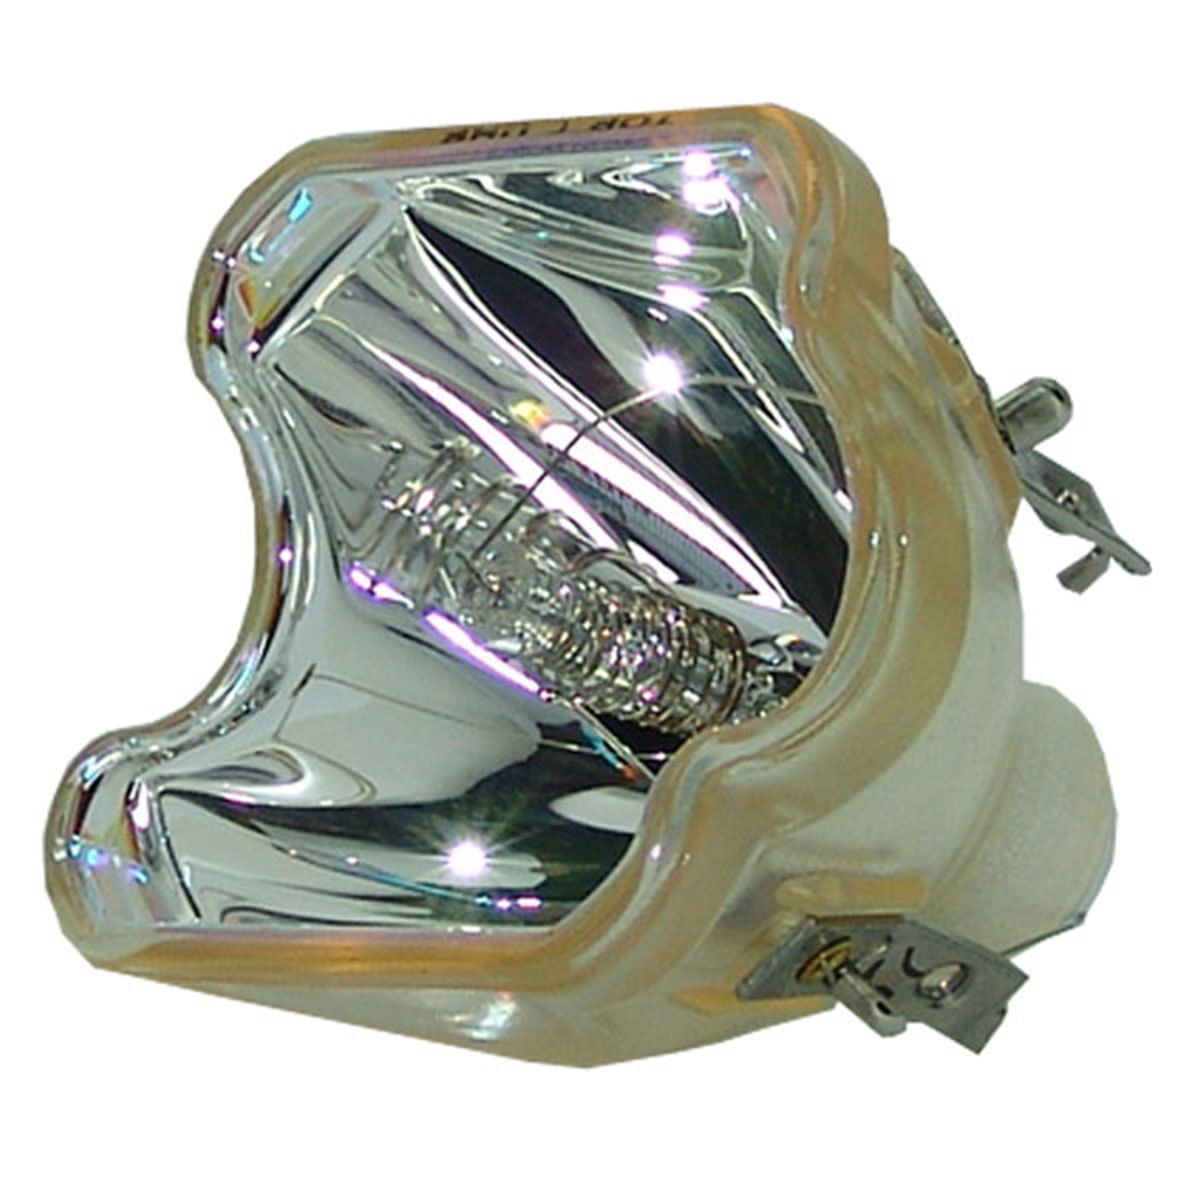 все цены на Compatible Bare Bulb LMP-E180 LMPE180 for SONY VPL-CS7 VPL-DS100 VPL-ES1 Projector Lamp Bulbs without housing онлайн